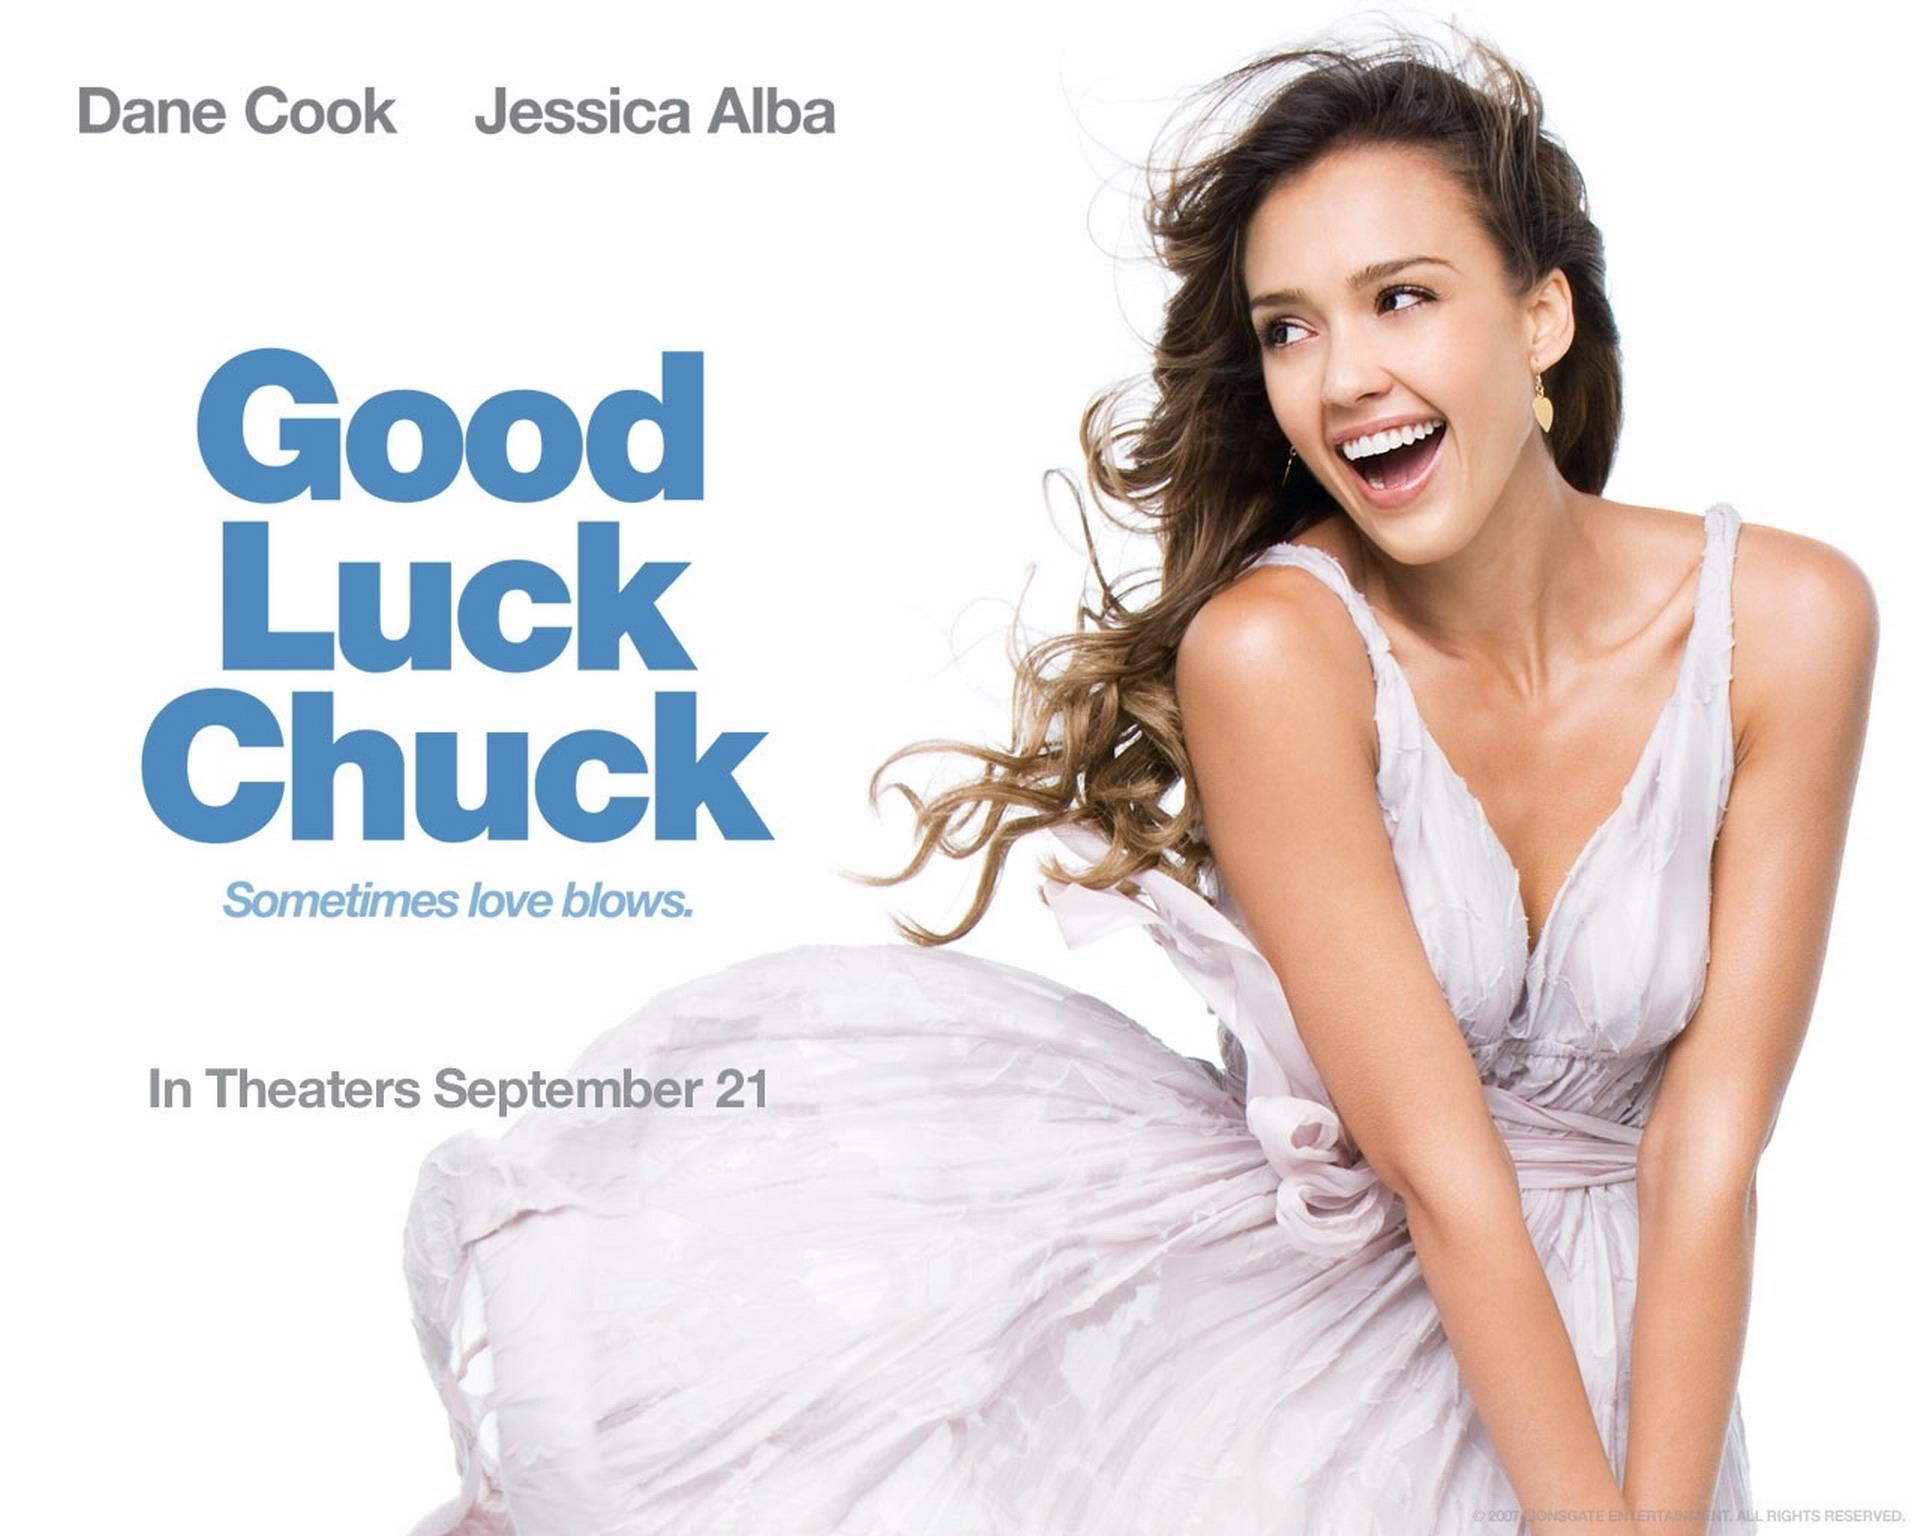 Good-Luck-Chuck-Jessica-Alba.jpg